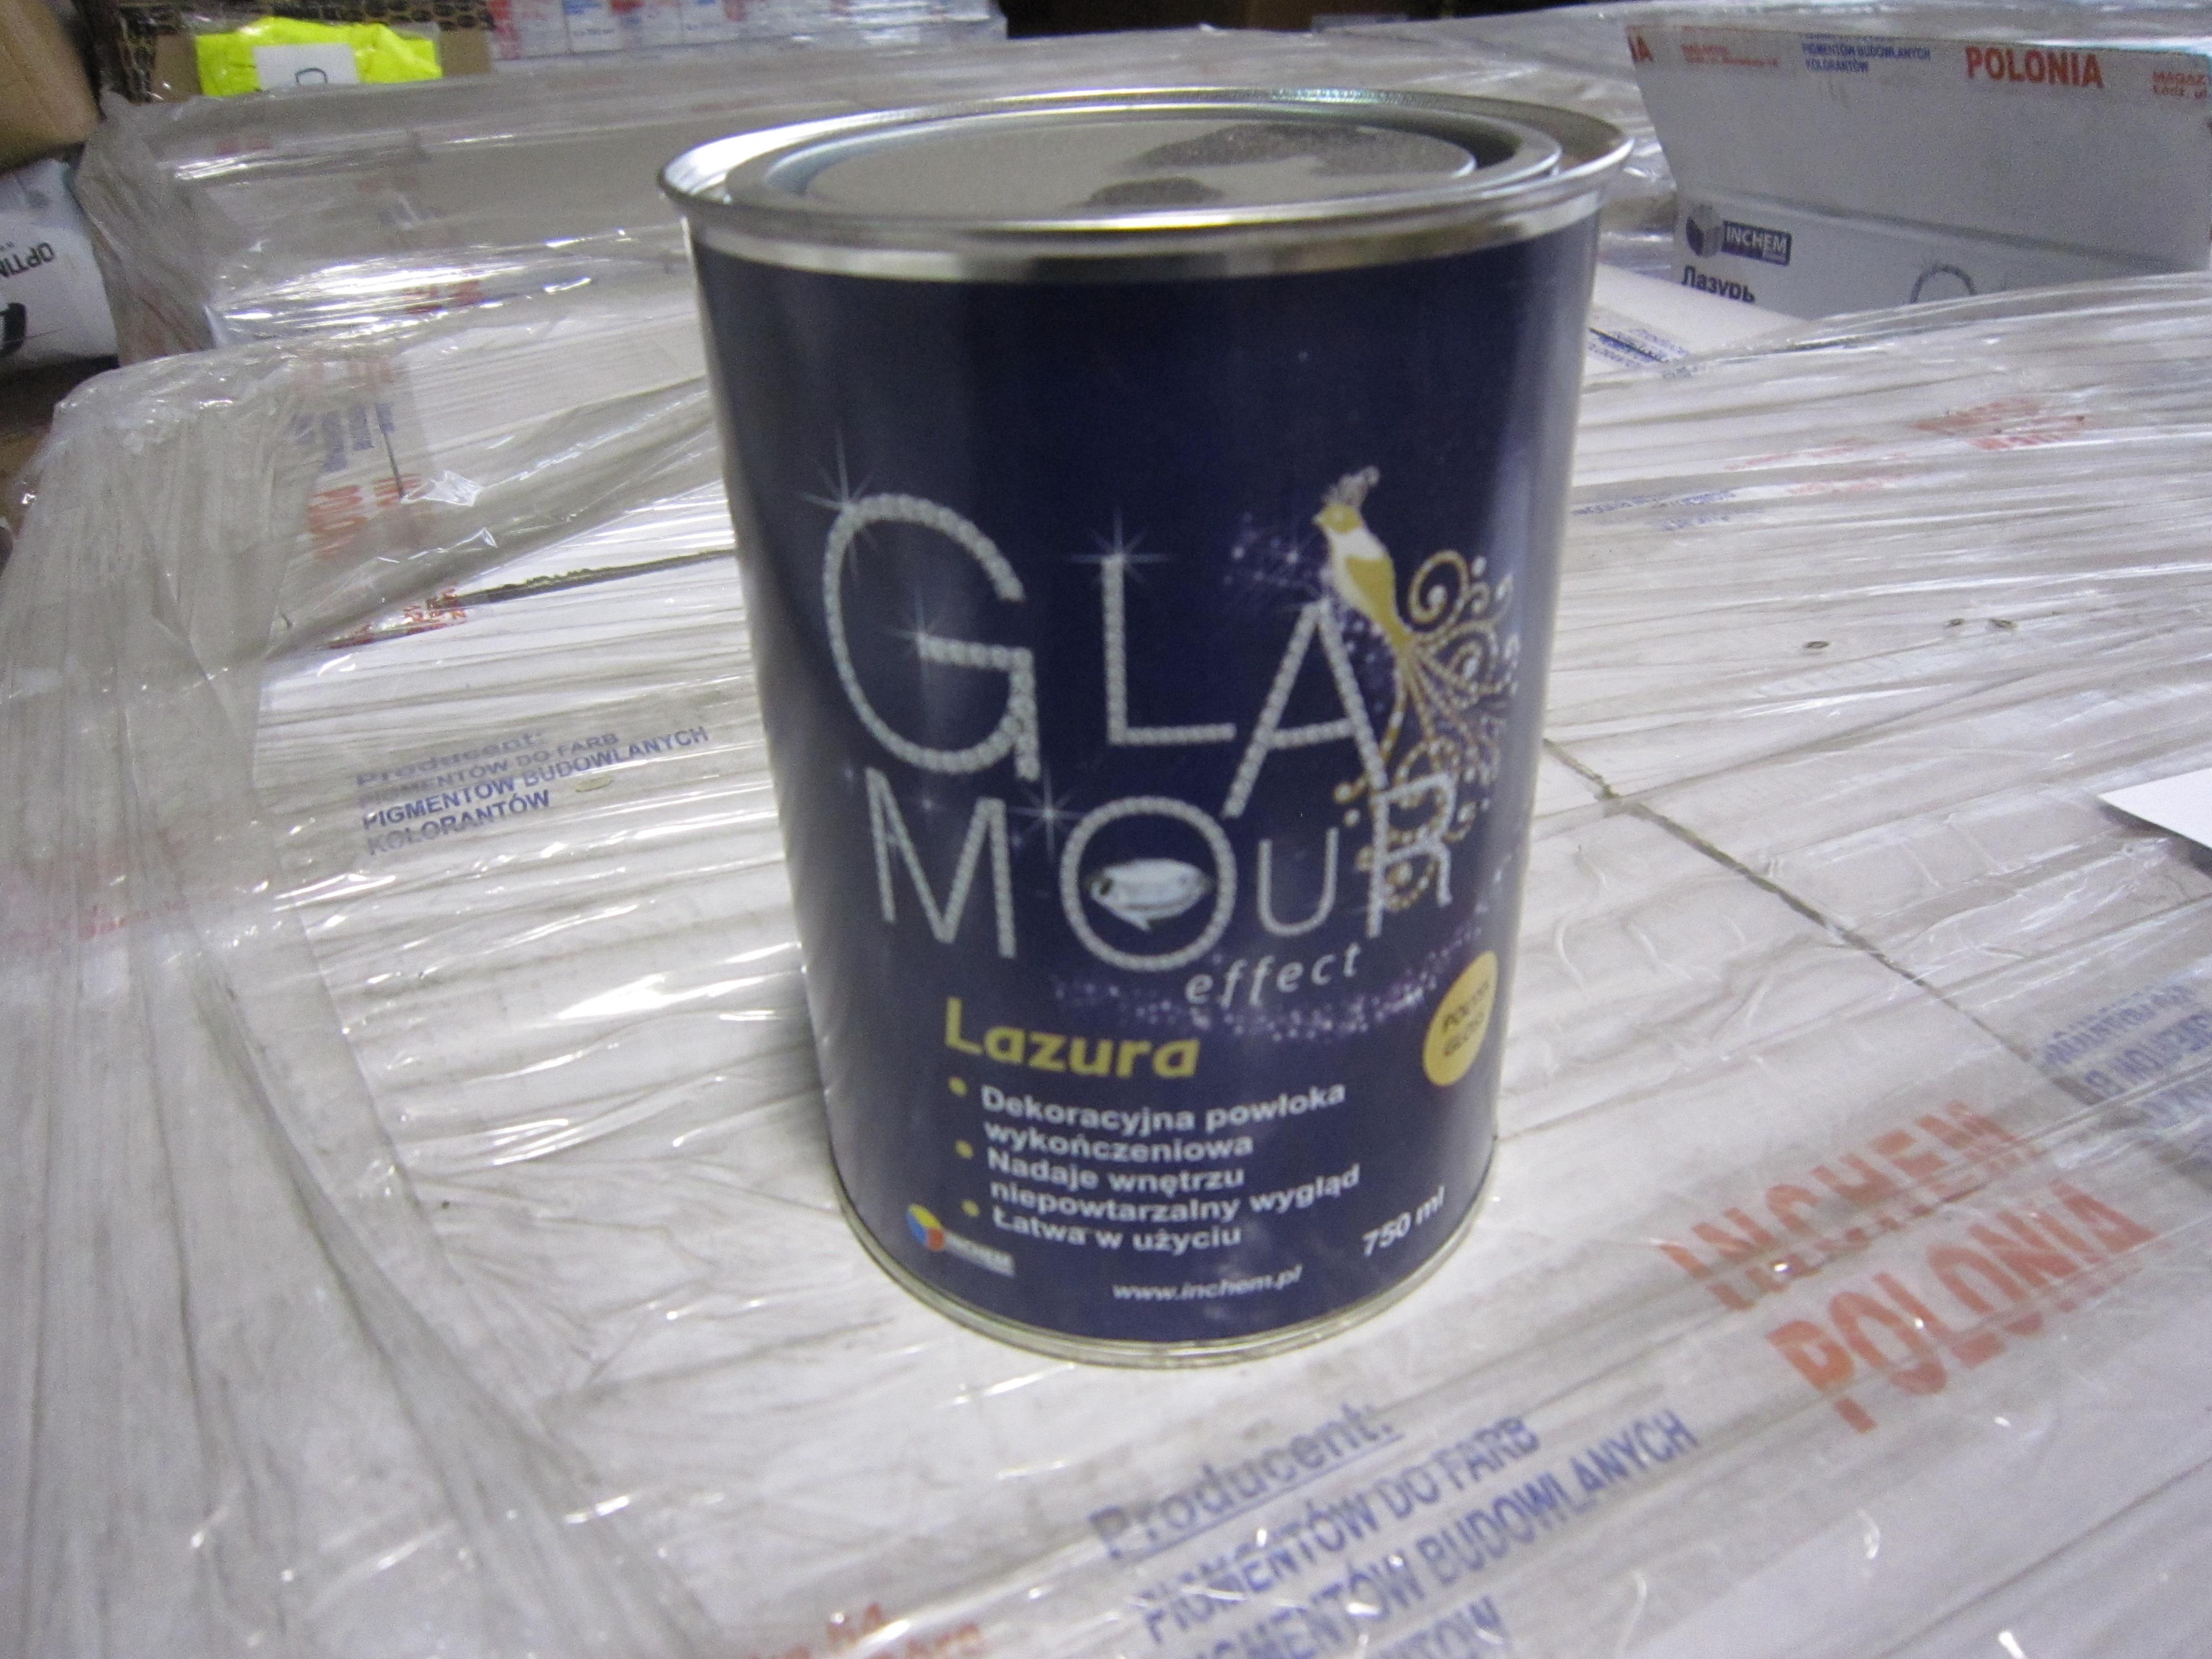 432 x Tins Glamour Effect Varnish Matt Finish   RRP £7,750 - Image 2 of 4